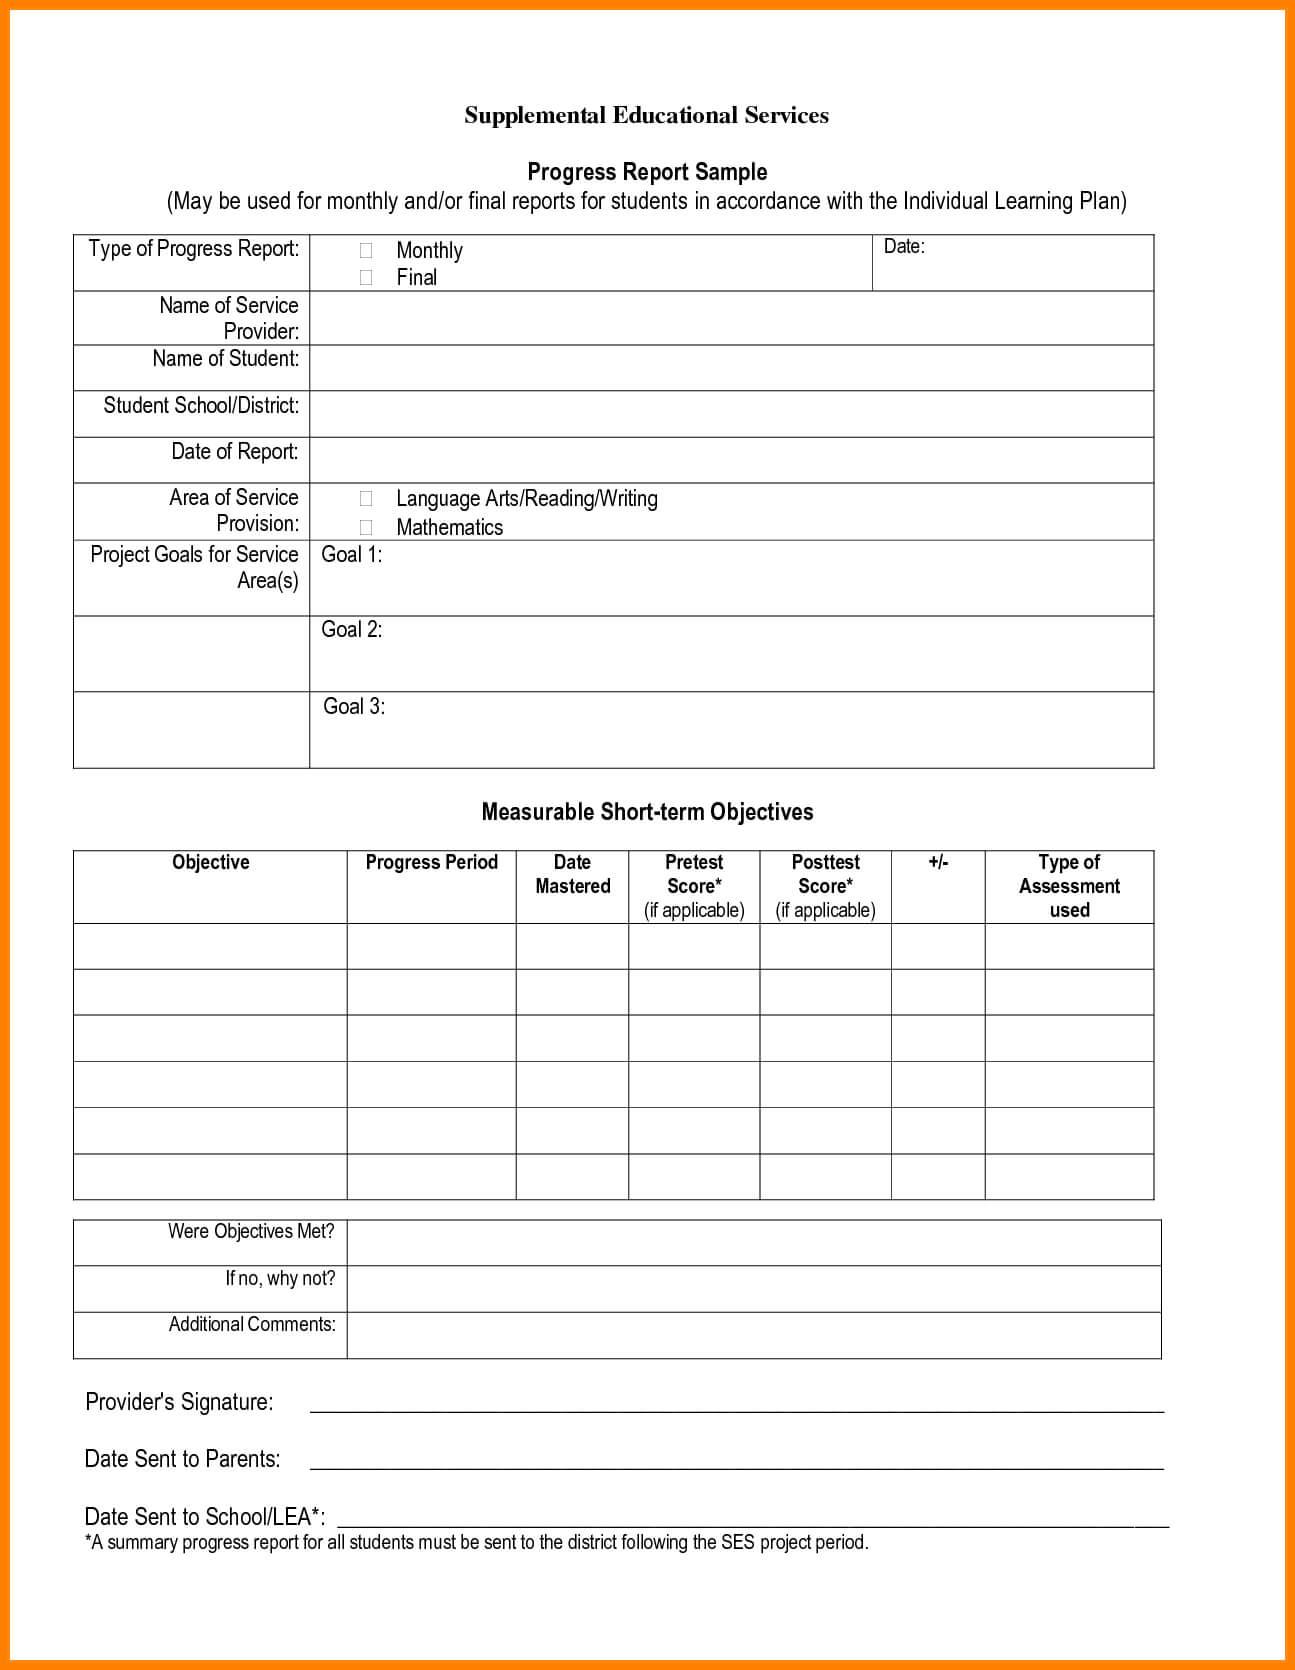 028 Student Progress Report Template Ideas Daily Beautiful with Educational Progress Report Template